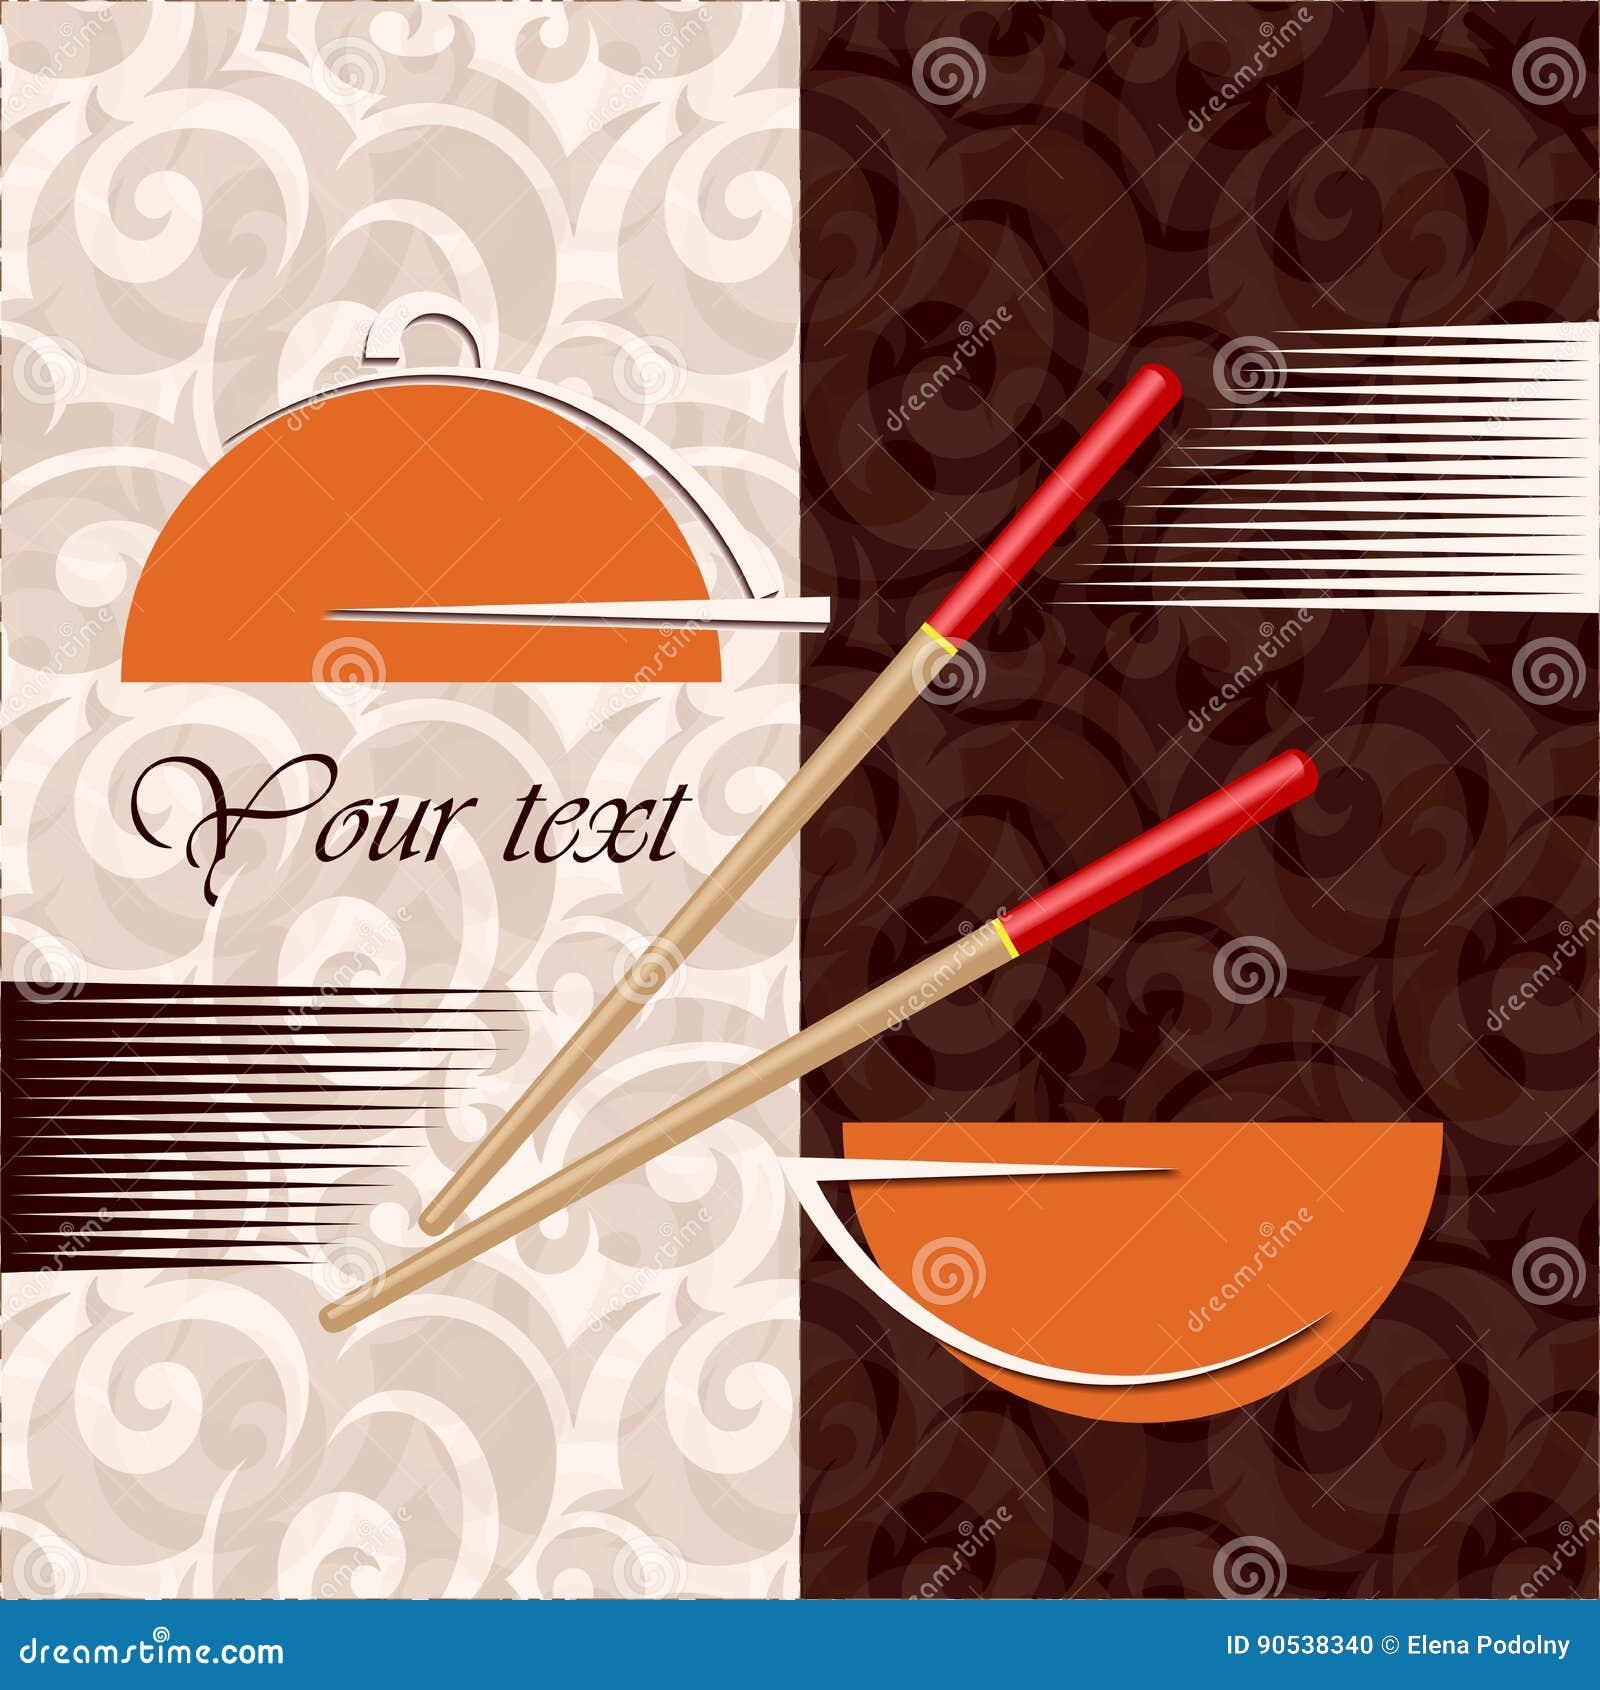 Creative Concept For Asian Restaurant Or Cafe Stock Vector